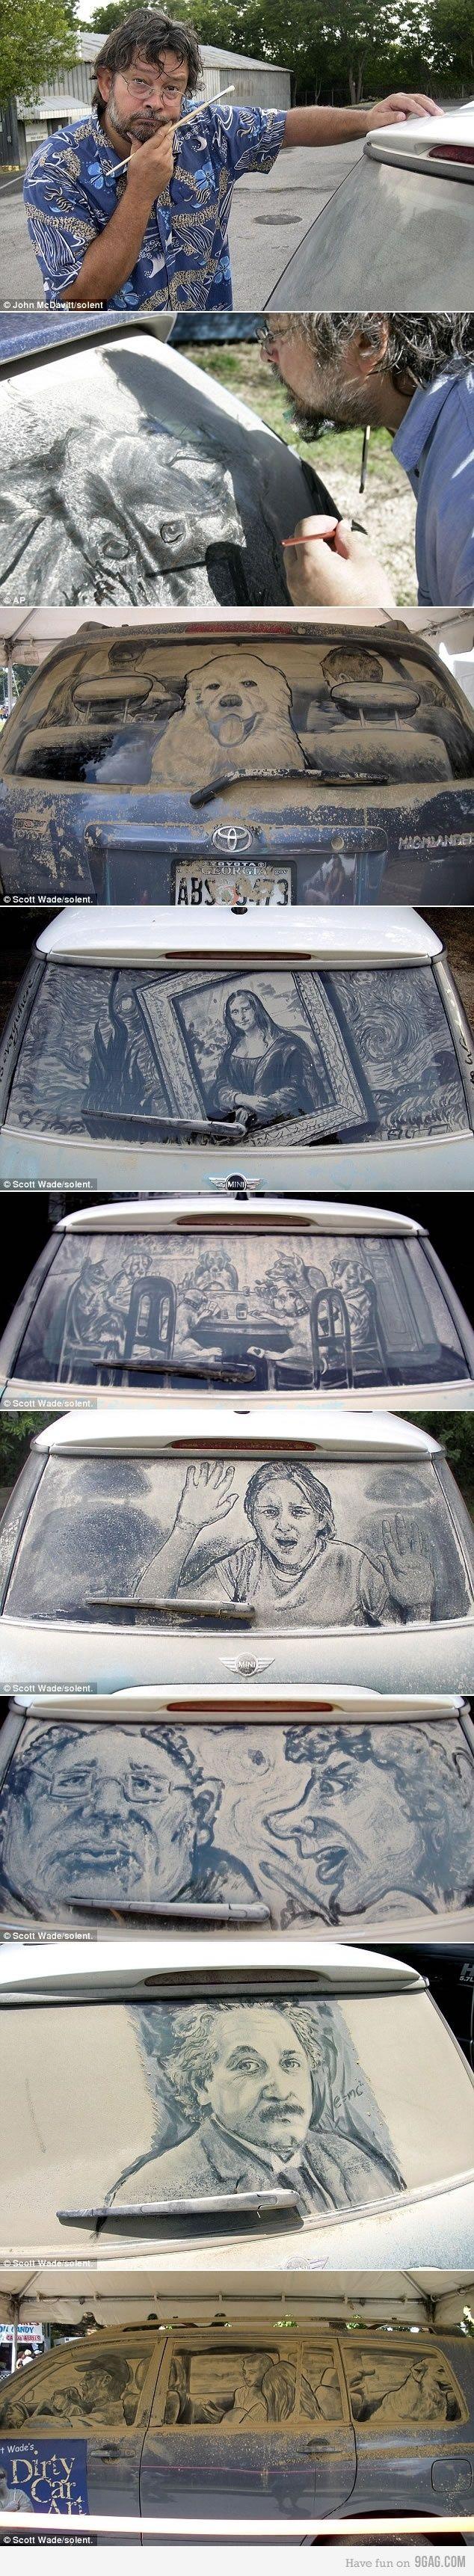 Amazing artwork created in dirty vehicle windows